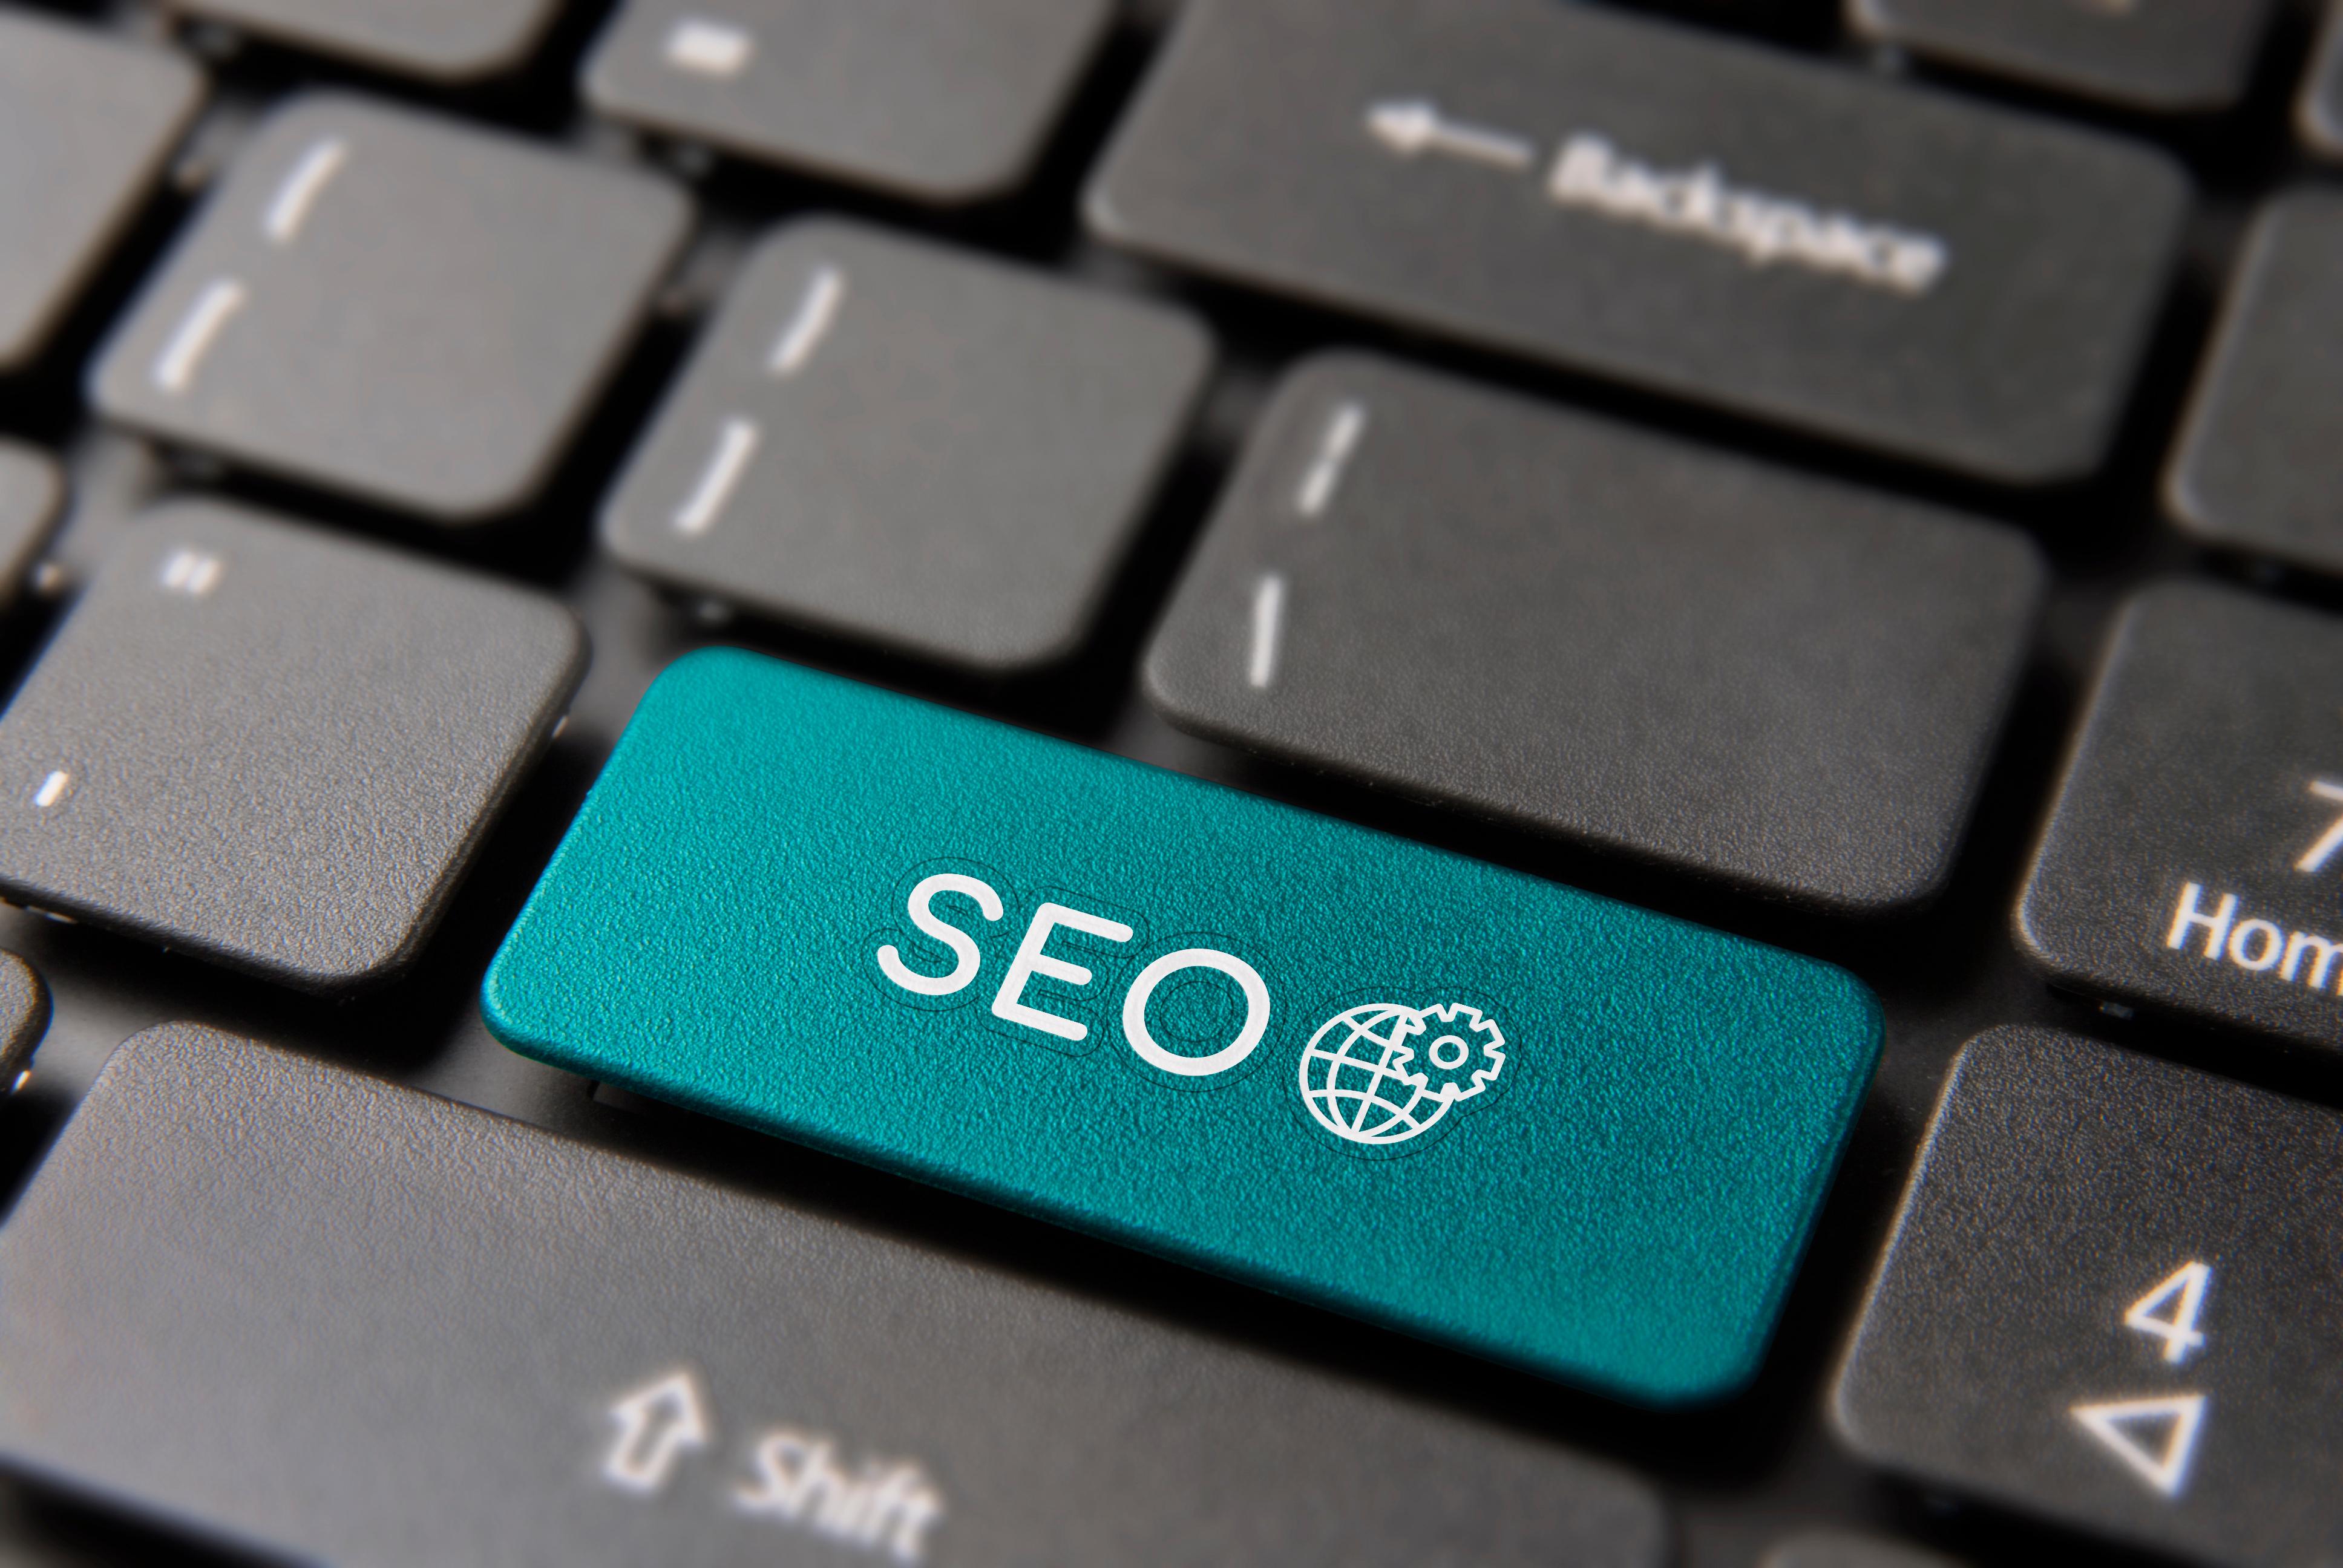 SEO Services image